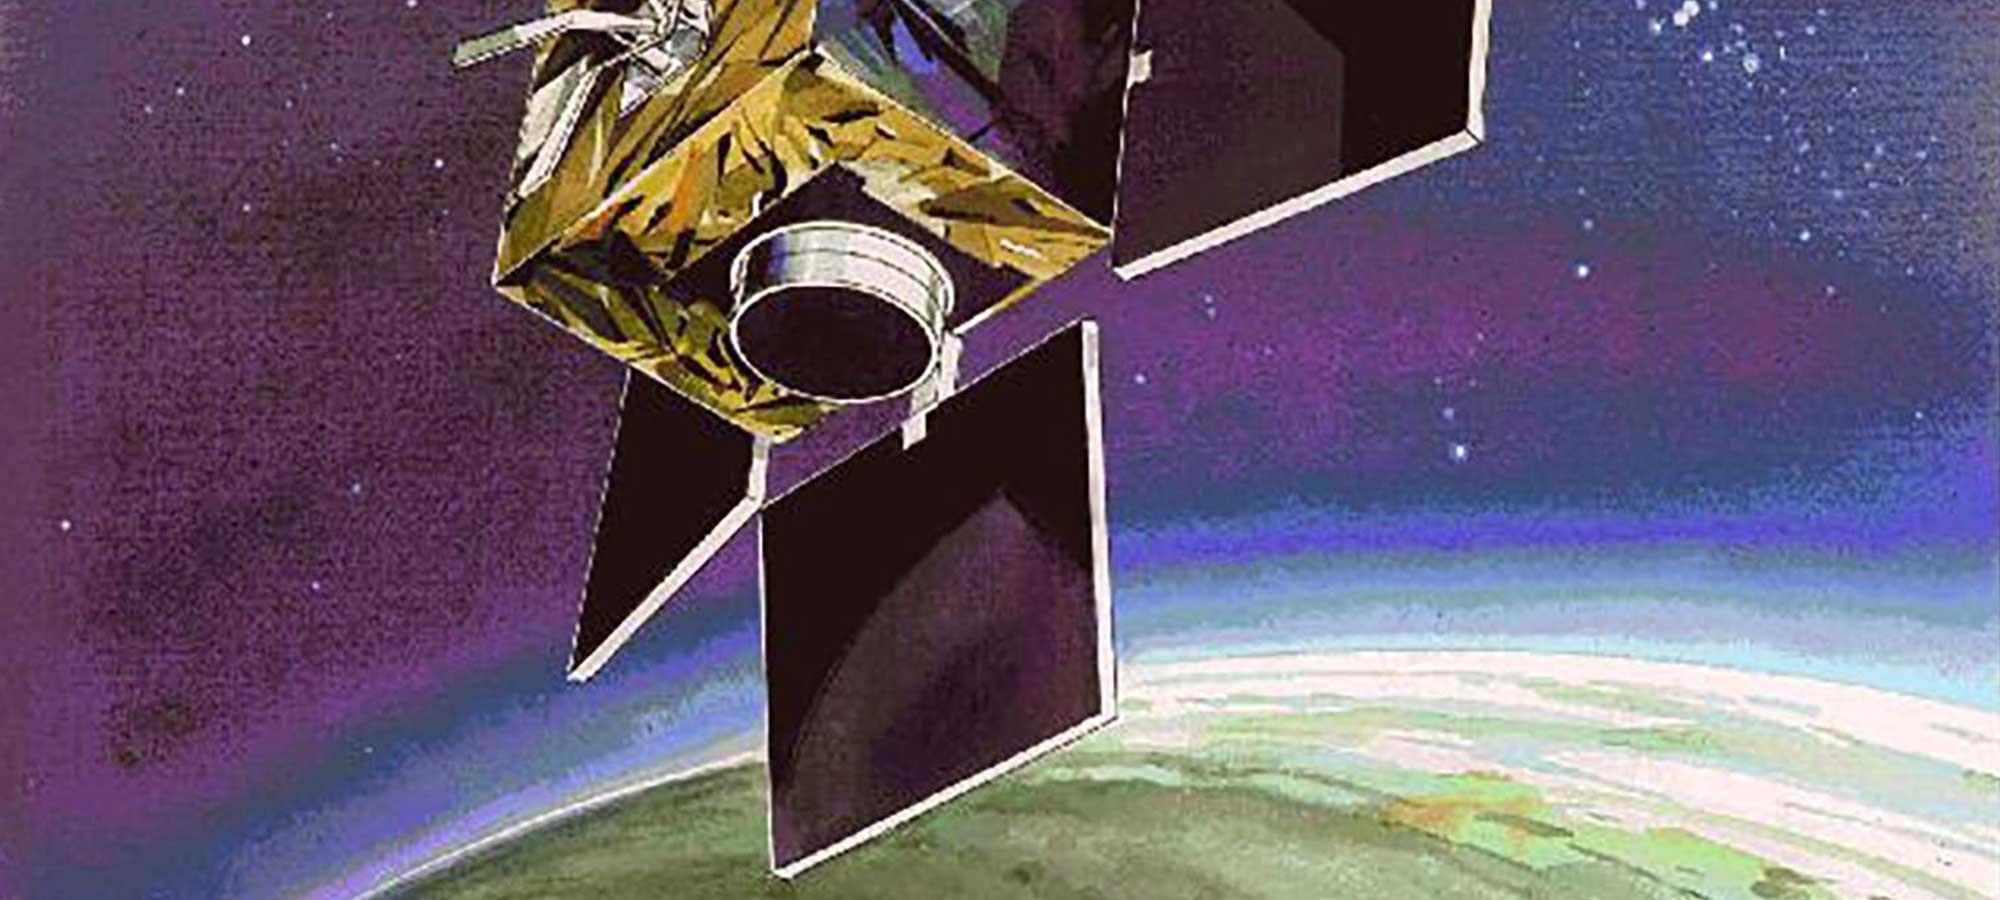 Satelliten Astrid 1